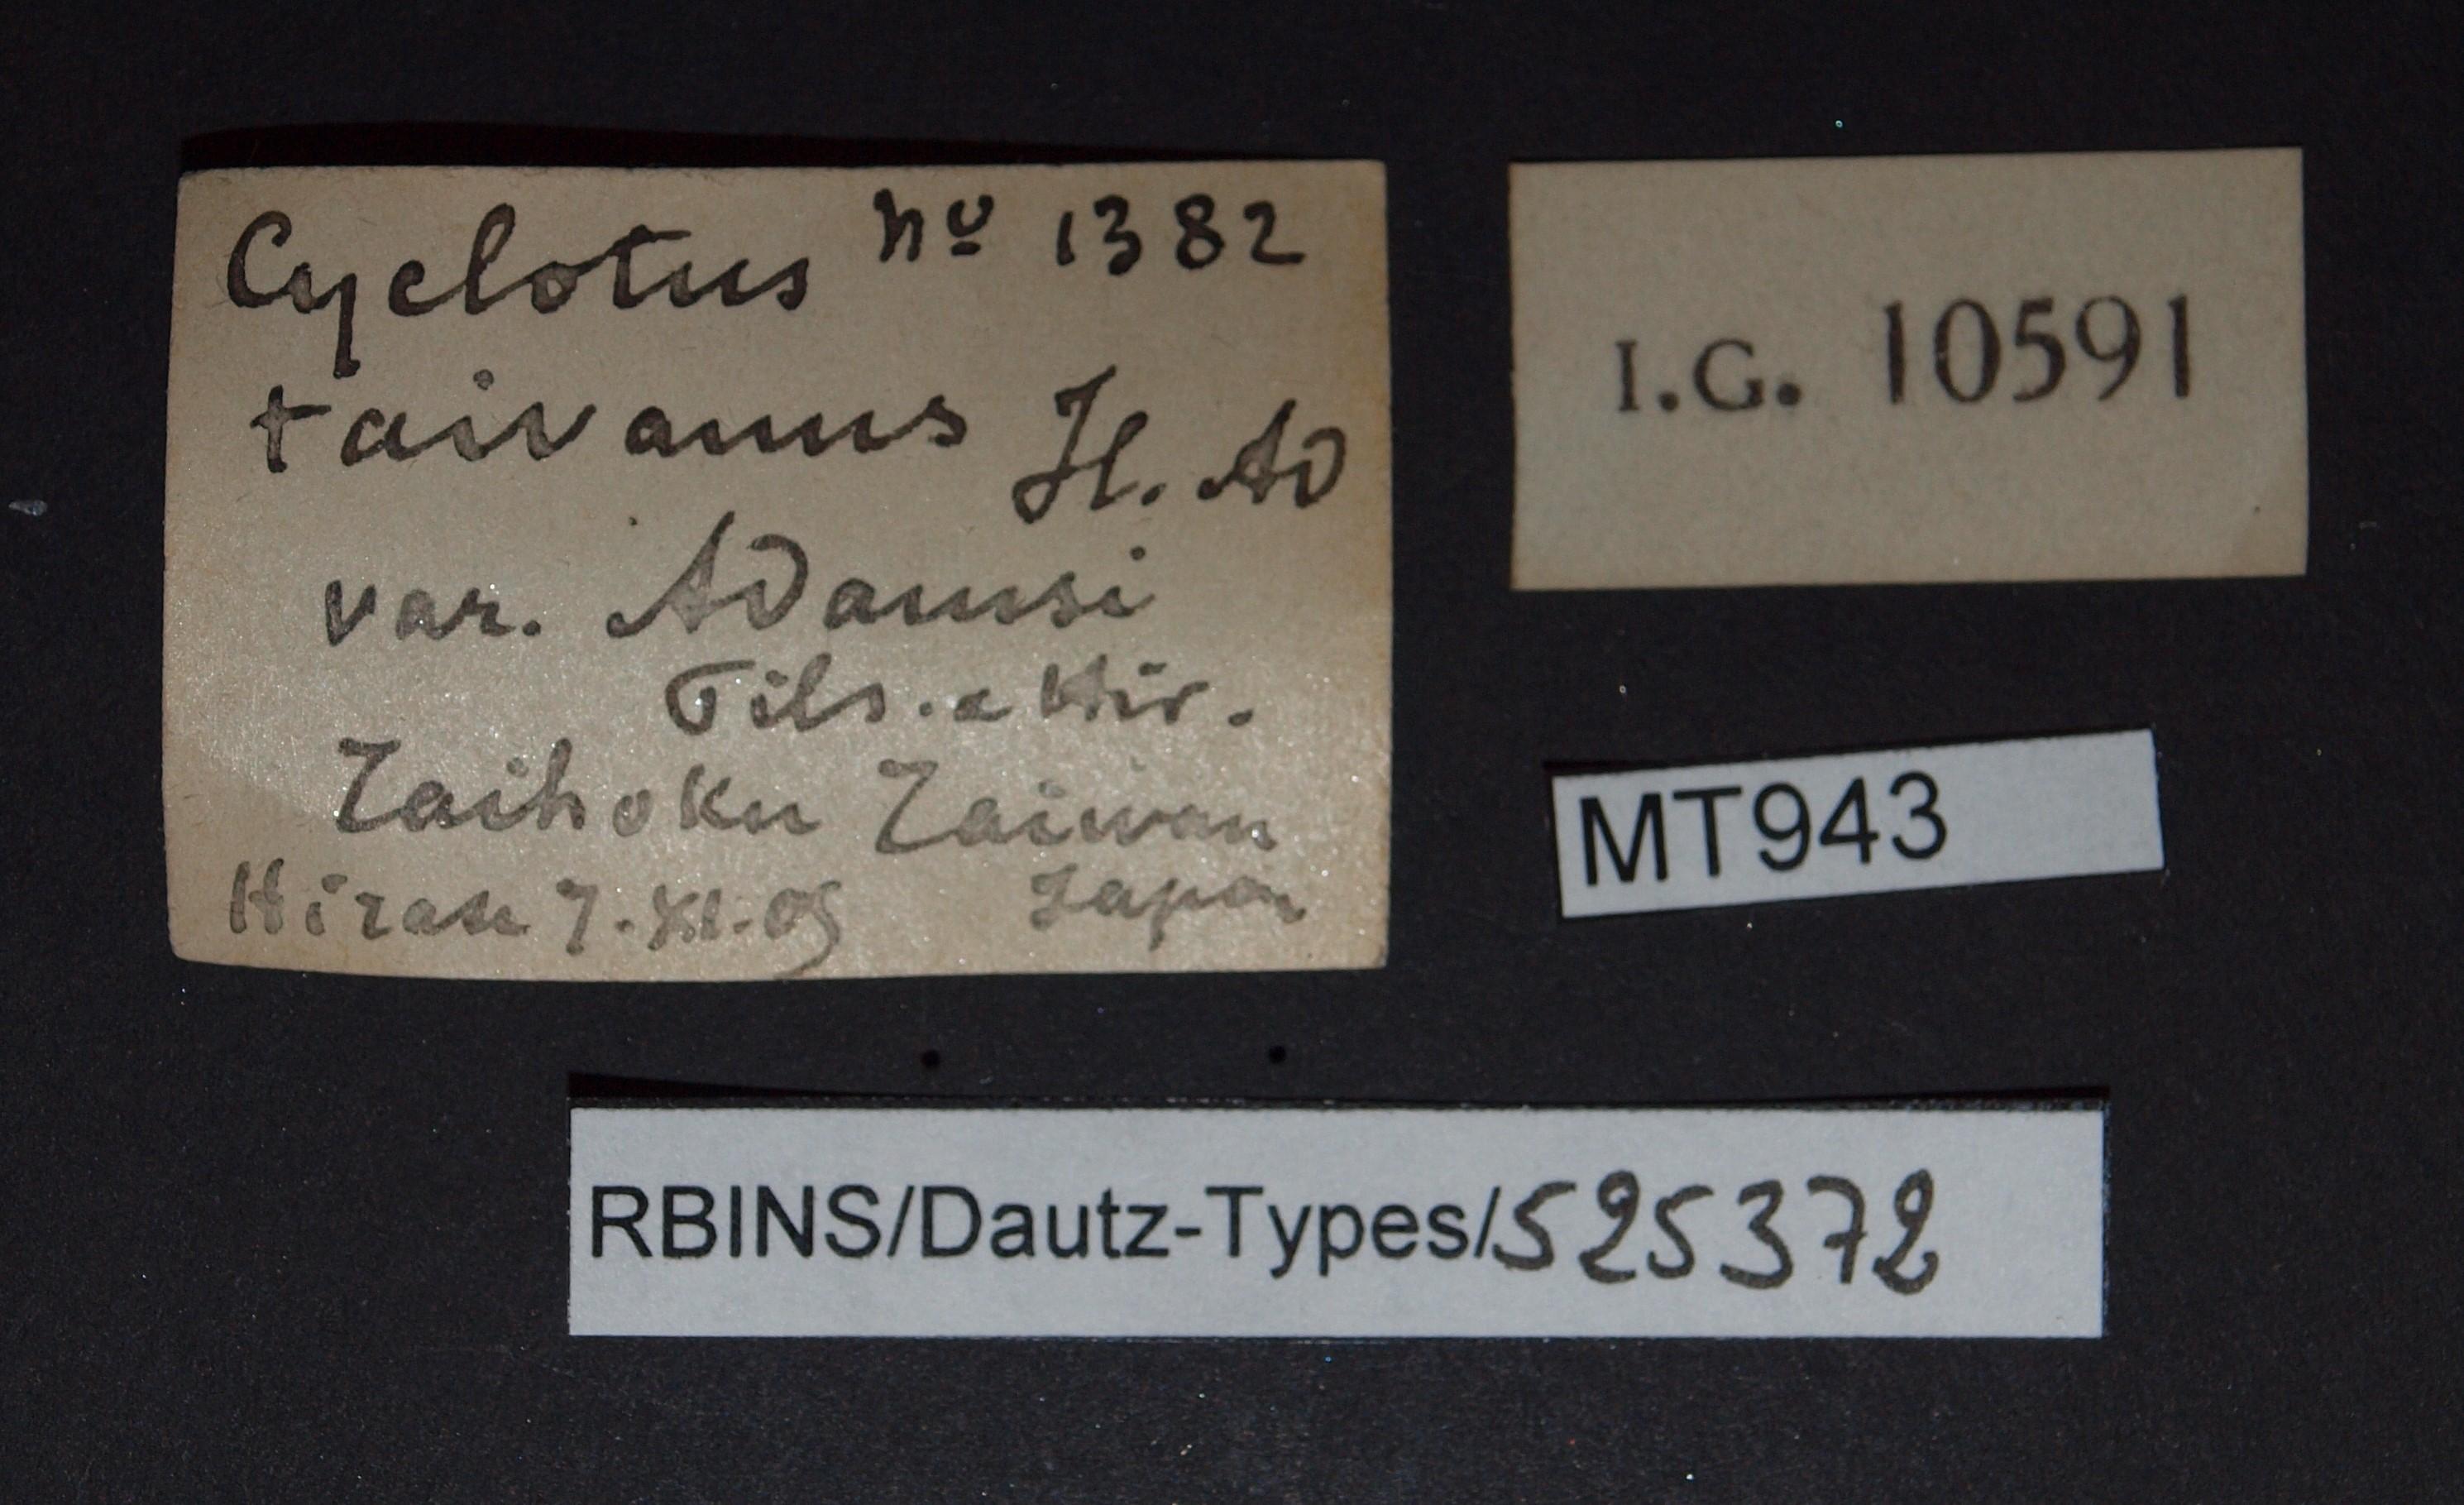 BE-RBINS-INV MT 943 Cyclotus taivanus var. adamsi pt Lb.jpg